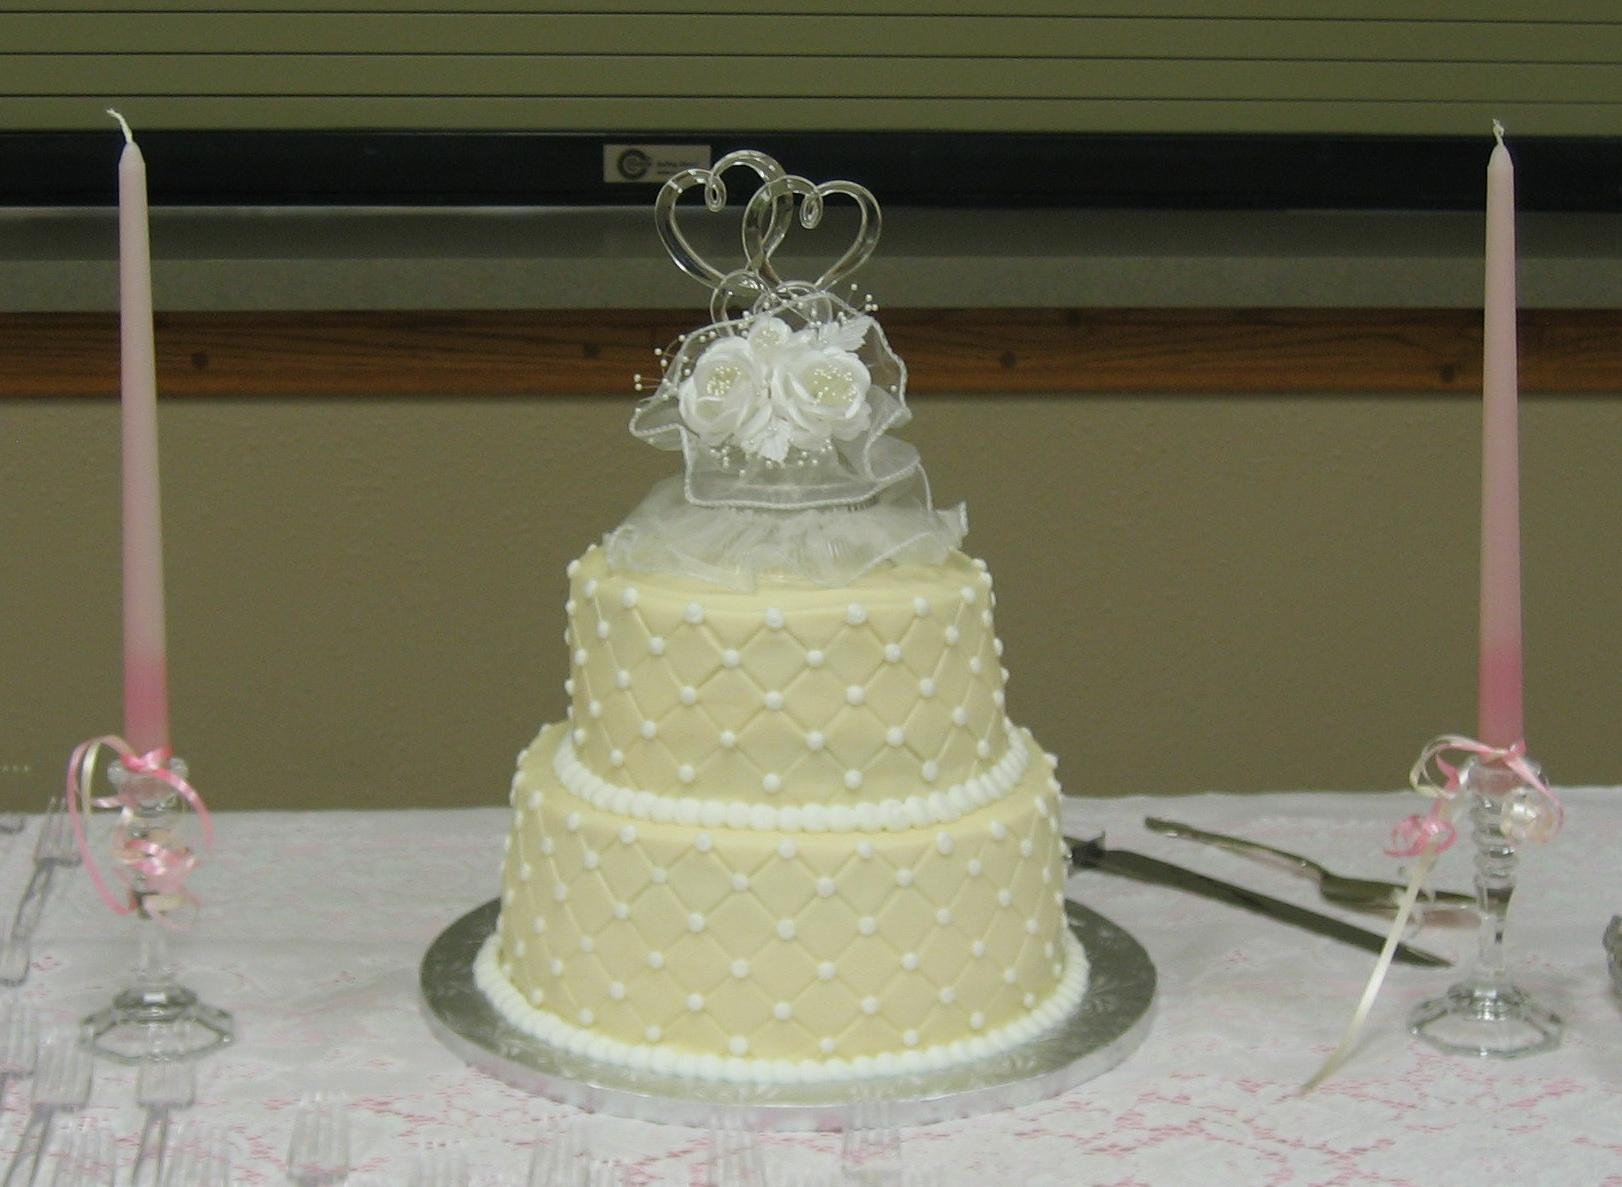 60th Wedding Anniversary Decorations Ideas - Elitflat